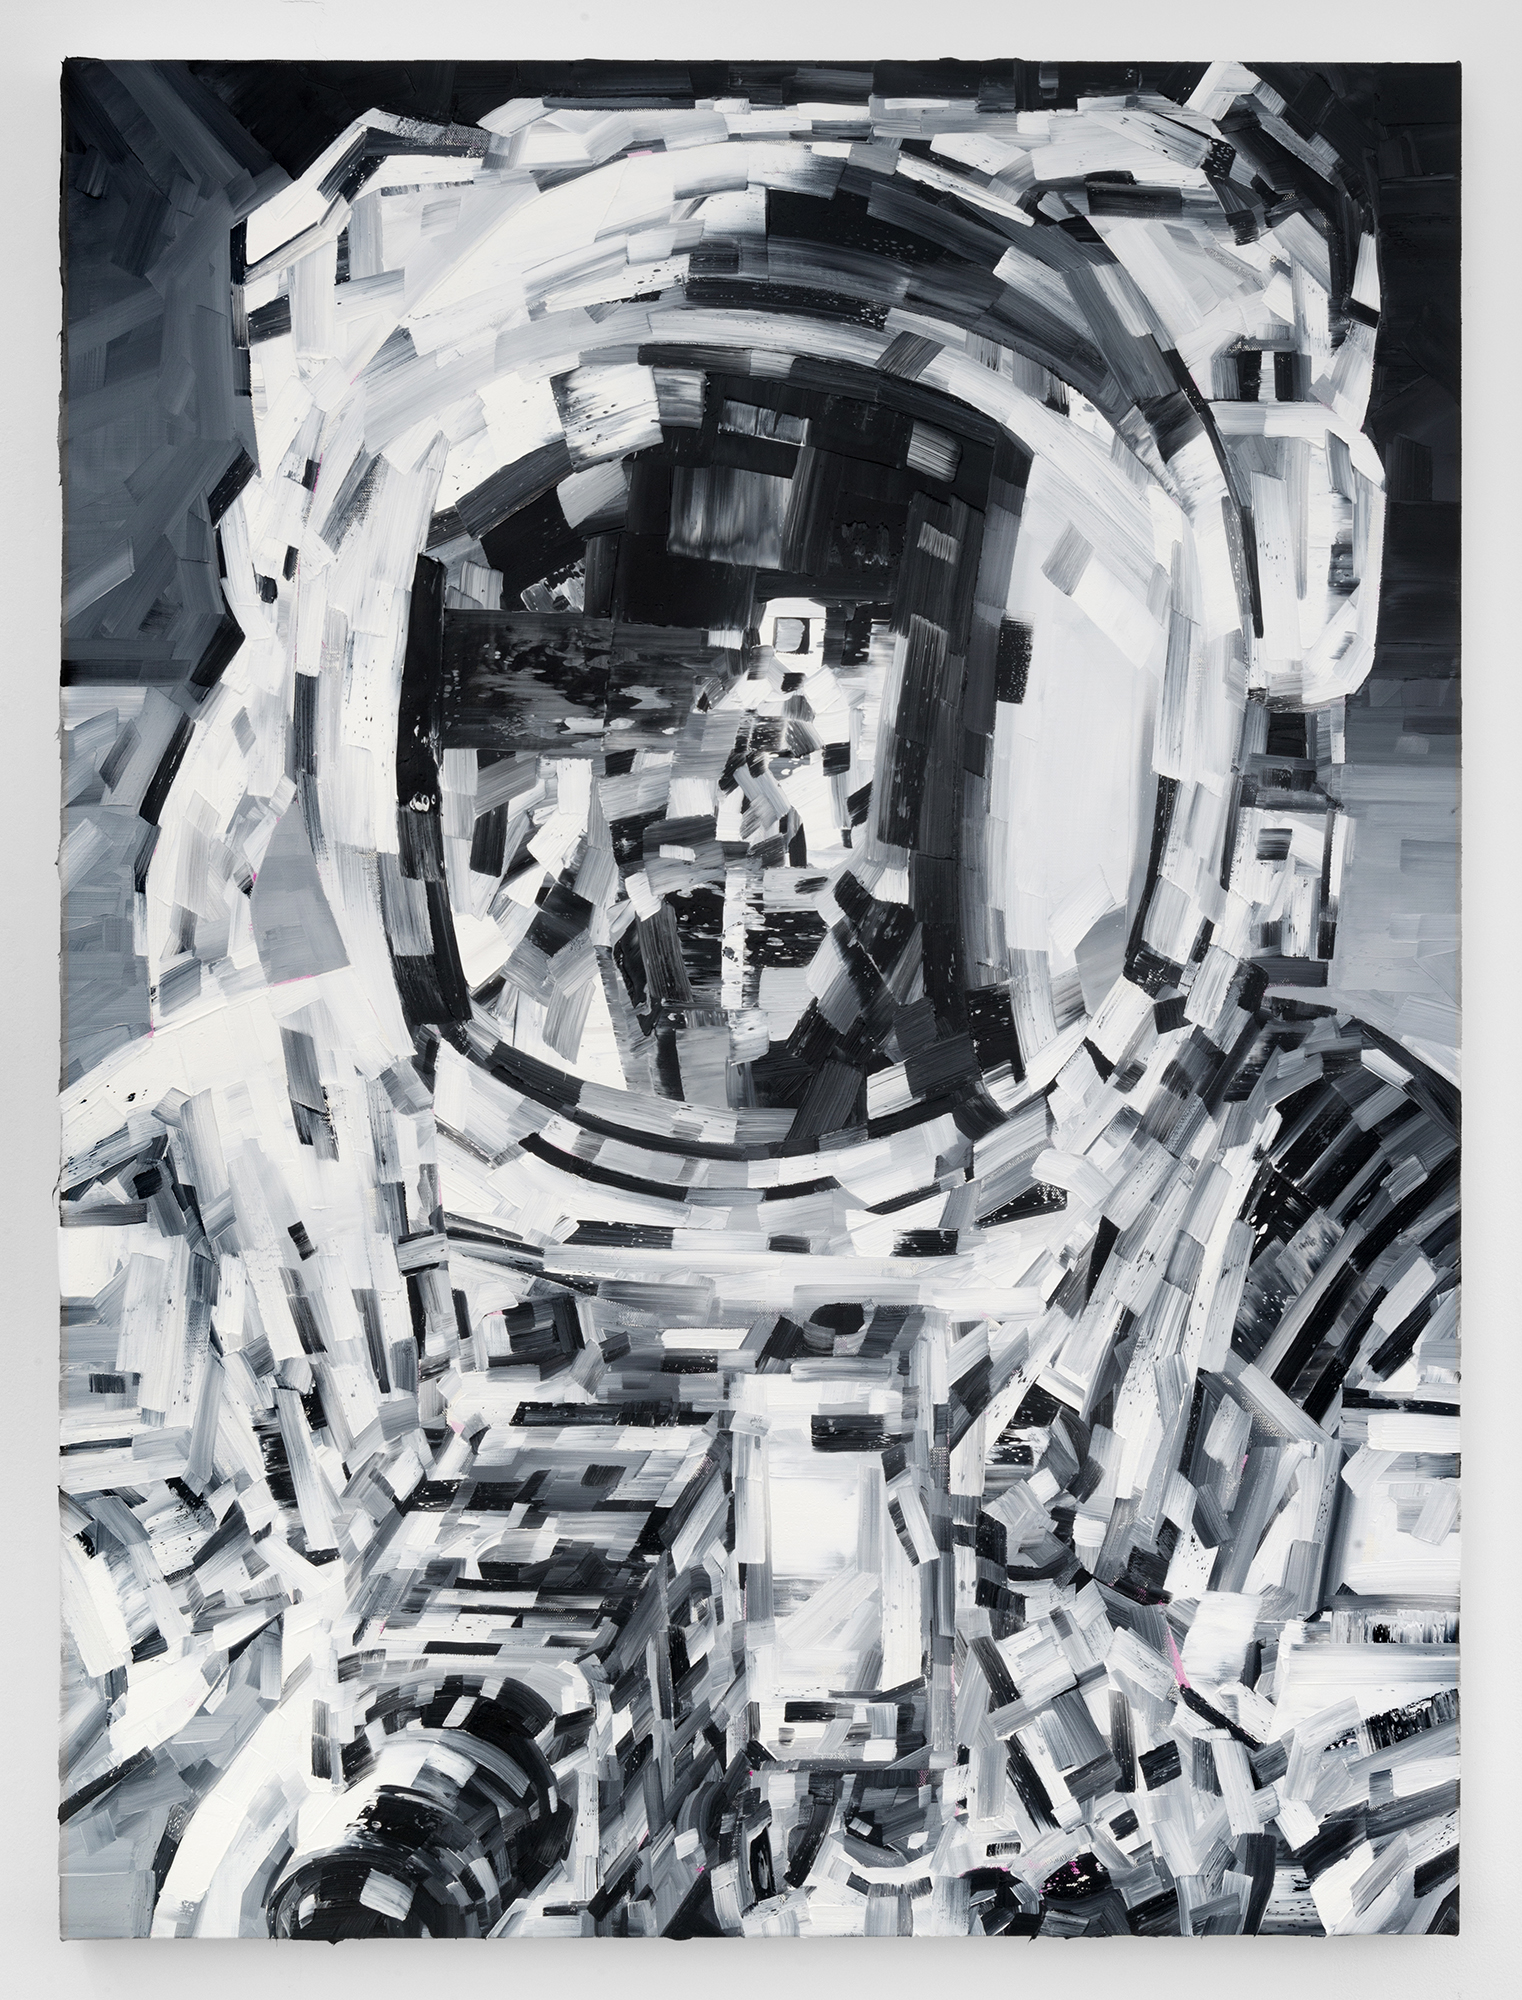 Michael Kagan  Conrad, 2018  Oil on linen  40h x 30w in  101.60h x 76.20w cm  MK003